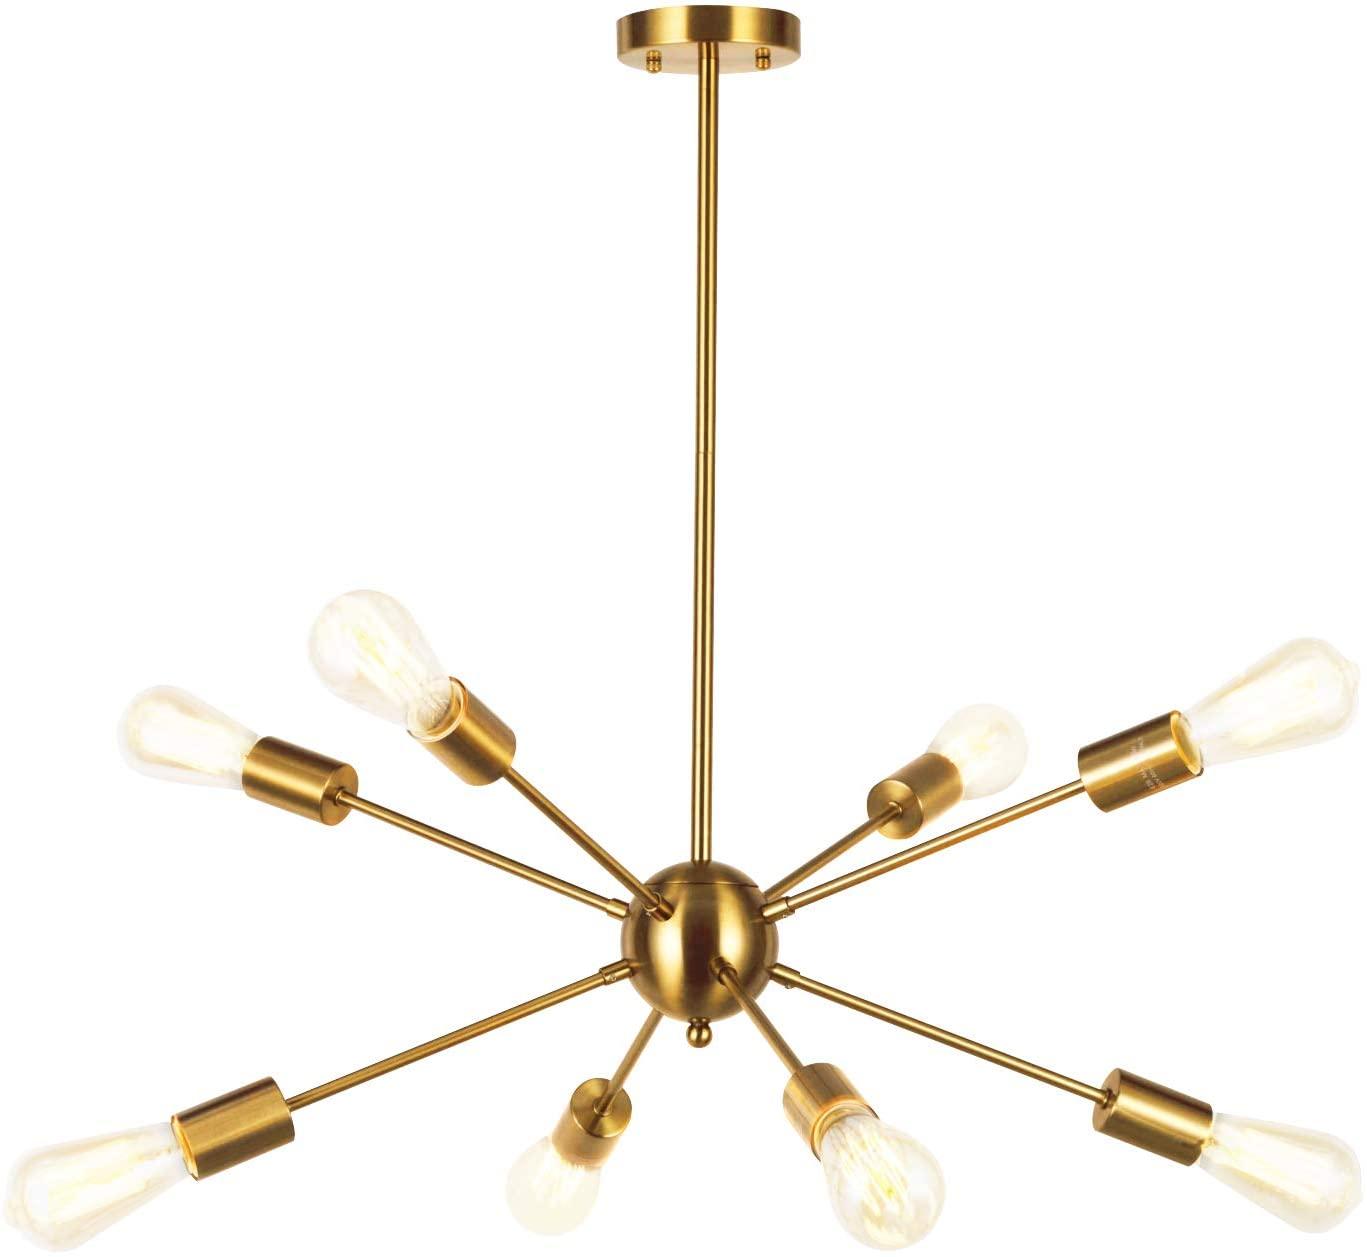 VINLUZ Sputnik Chandelier Contemporary 8 Lights Brushed Brass Modern Pendant lighting Gold Mid Century Ceiling Light Fixture for Dining Room Bed Room Kitchen Room UL Listed